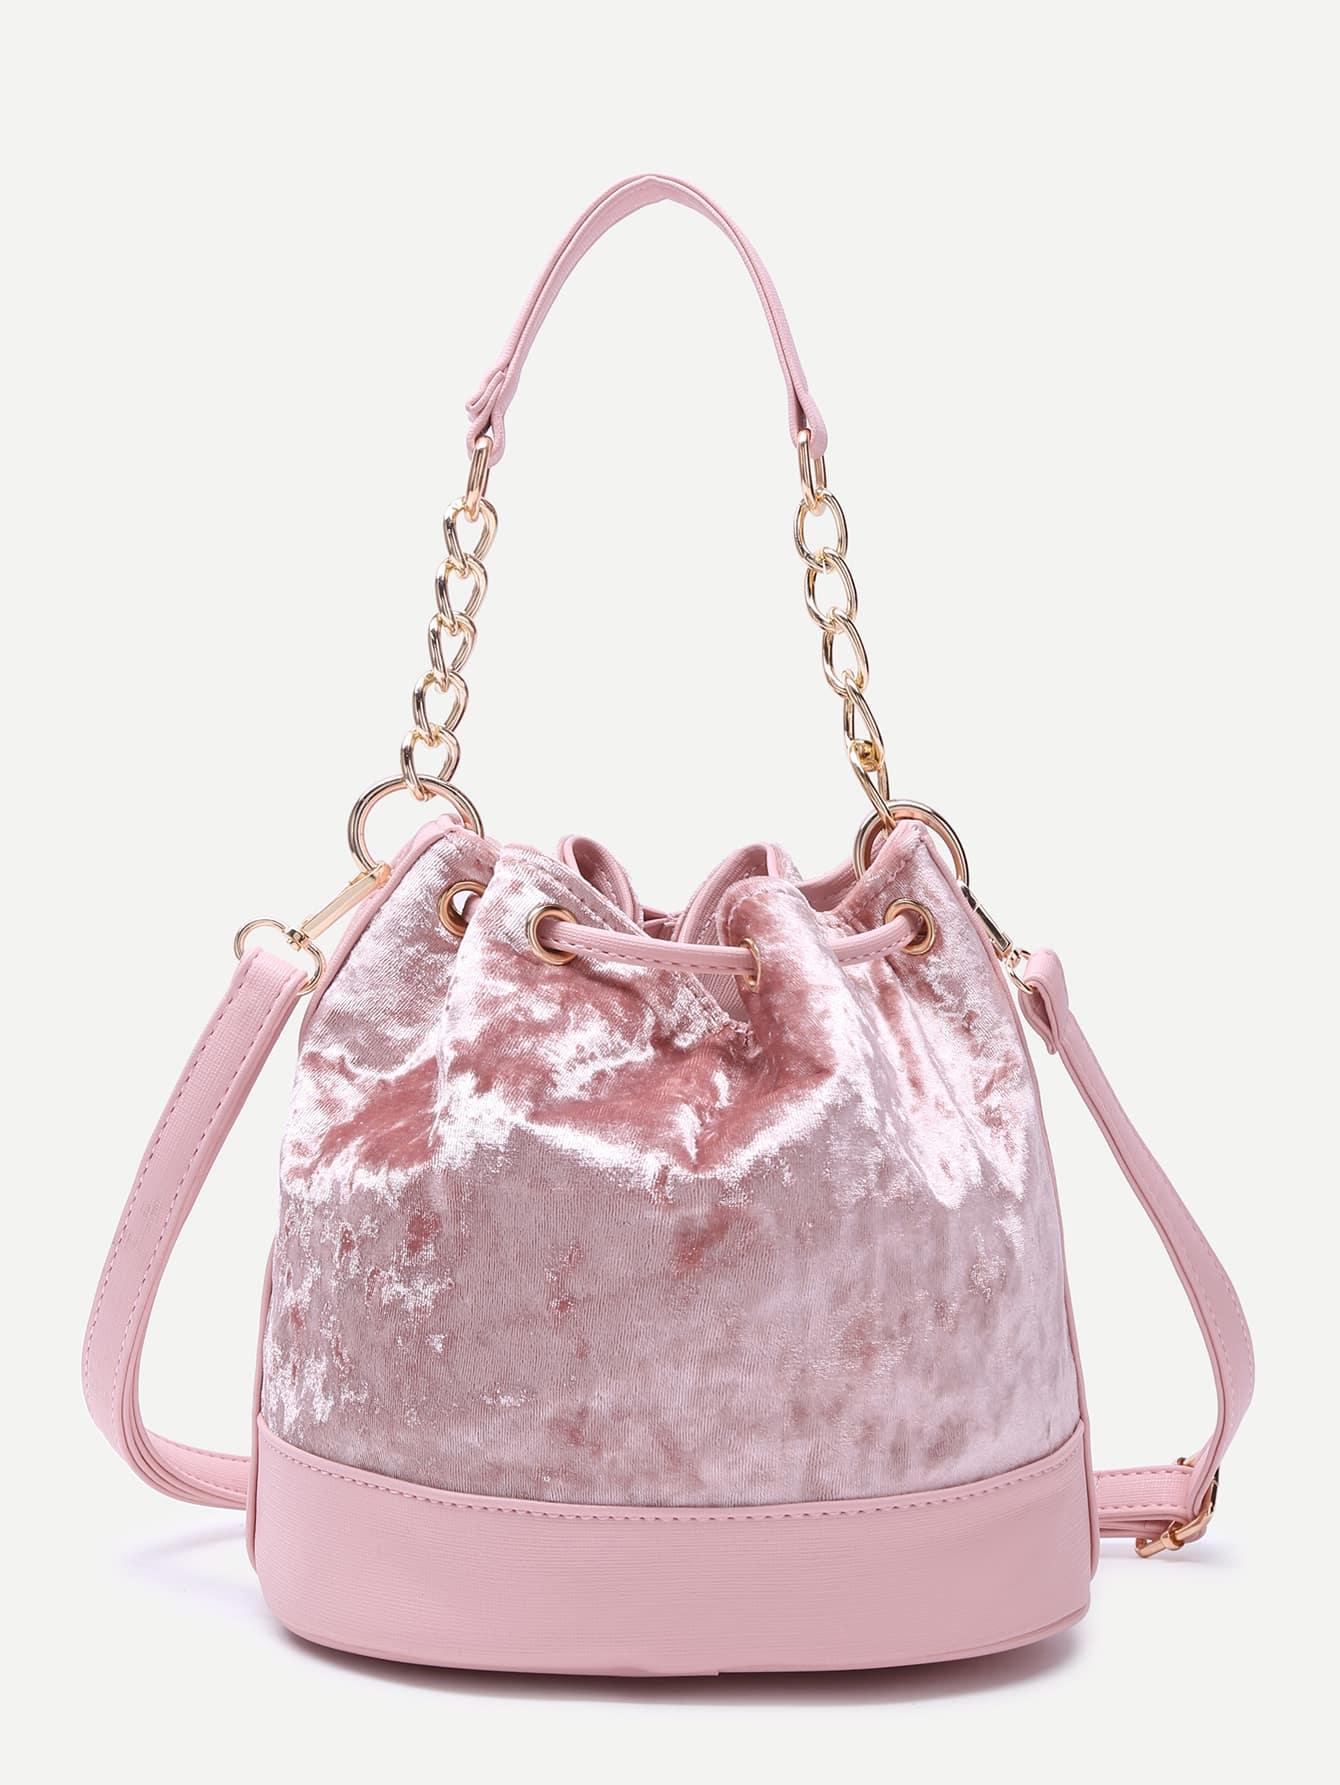 bag161122920_2